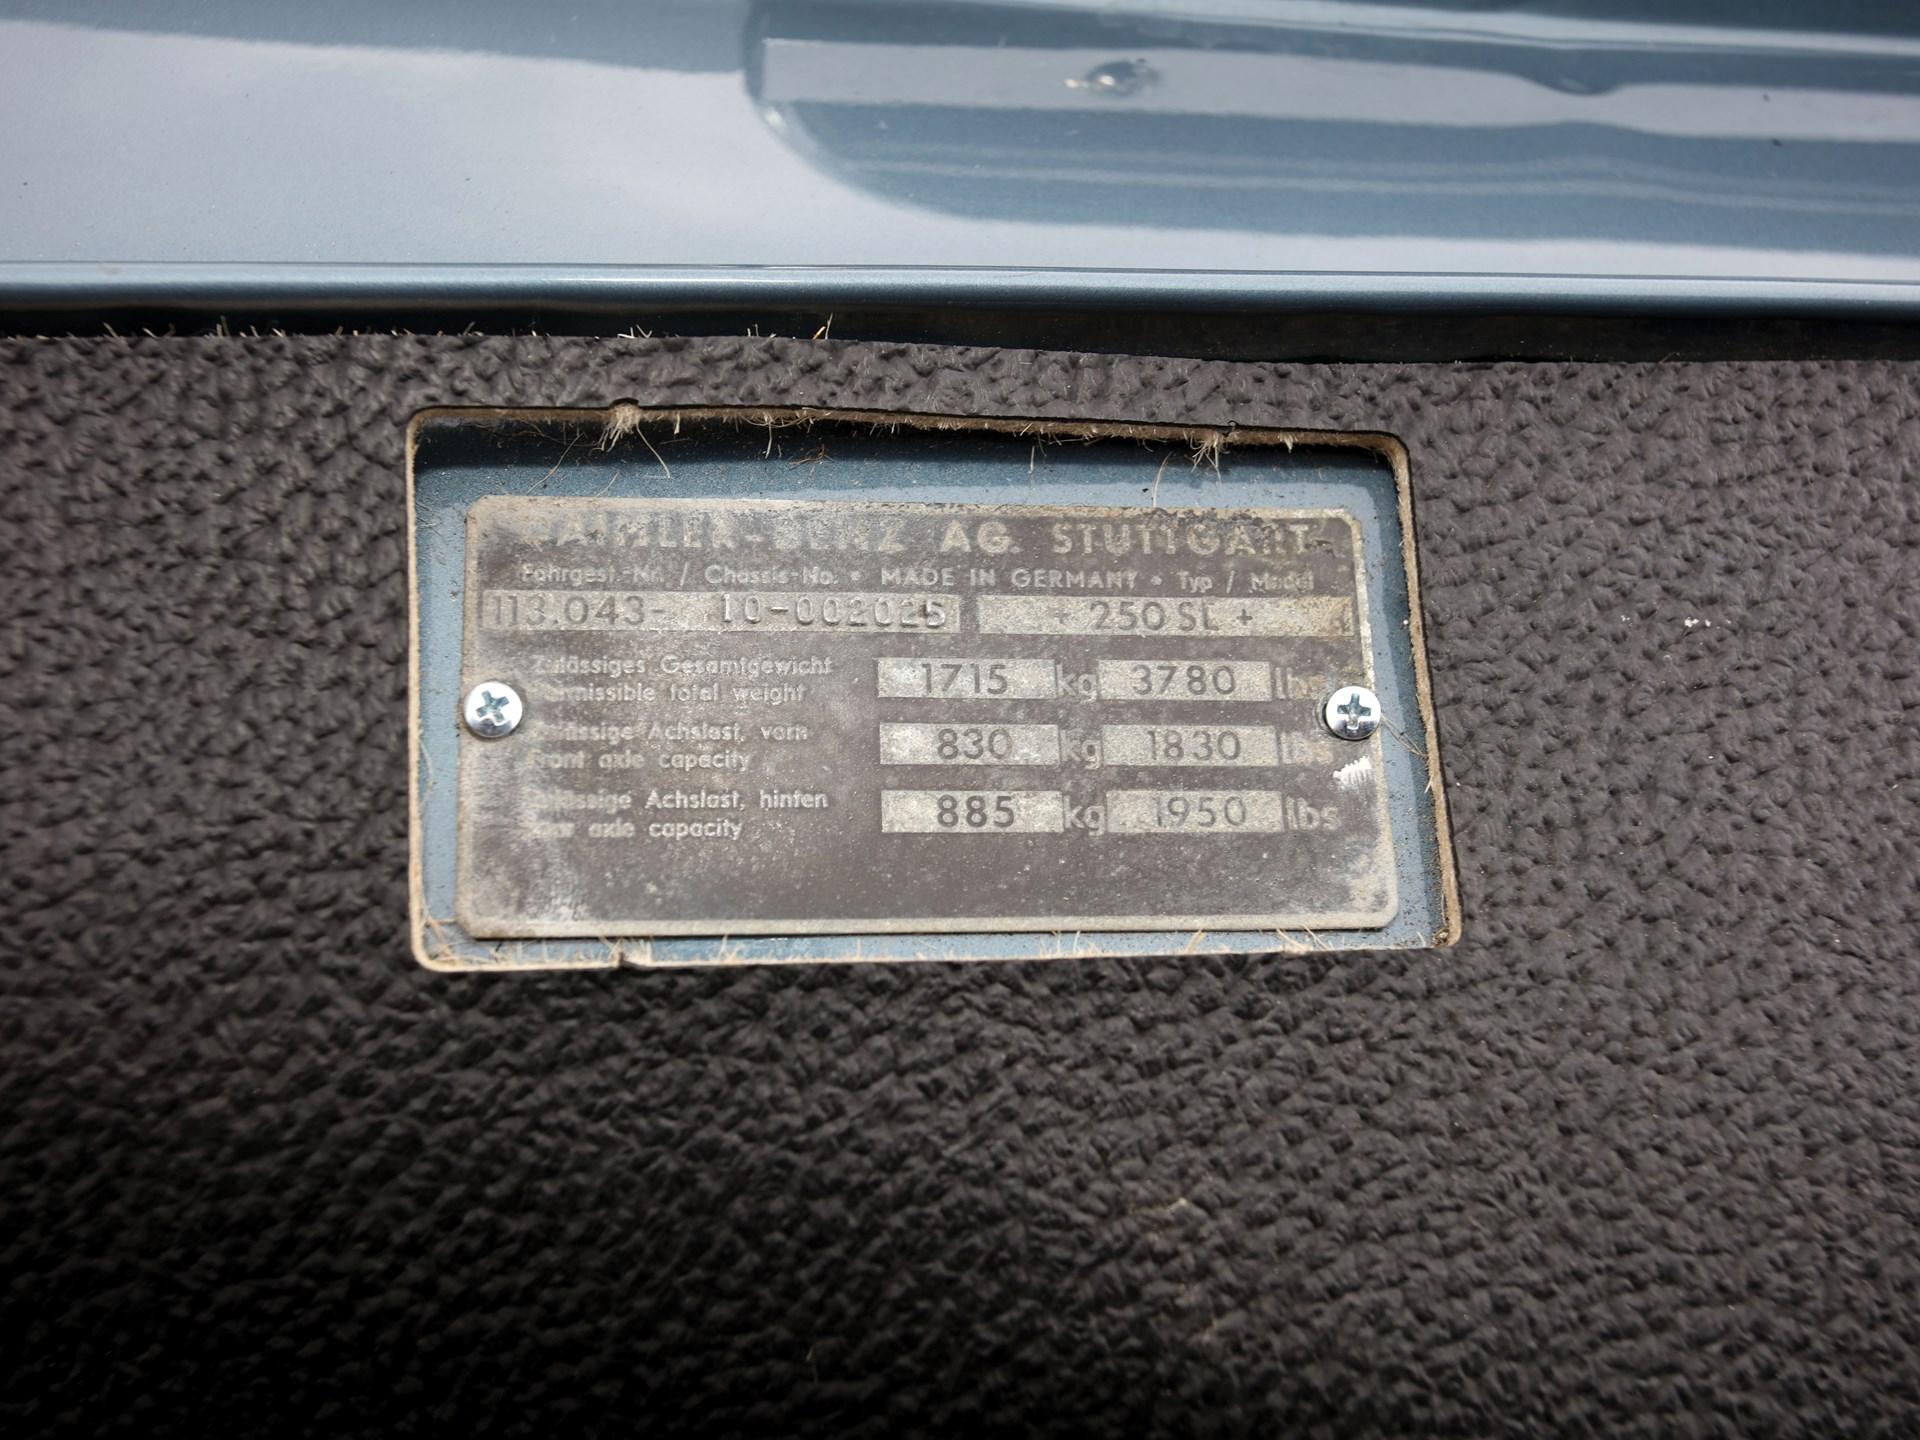 1967 Mercedes-Benz 250 SL 'Pagoda'